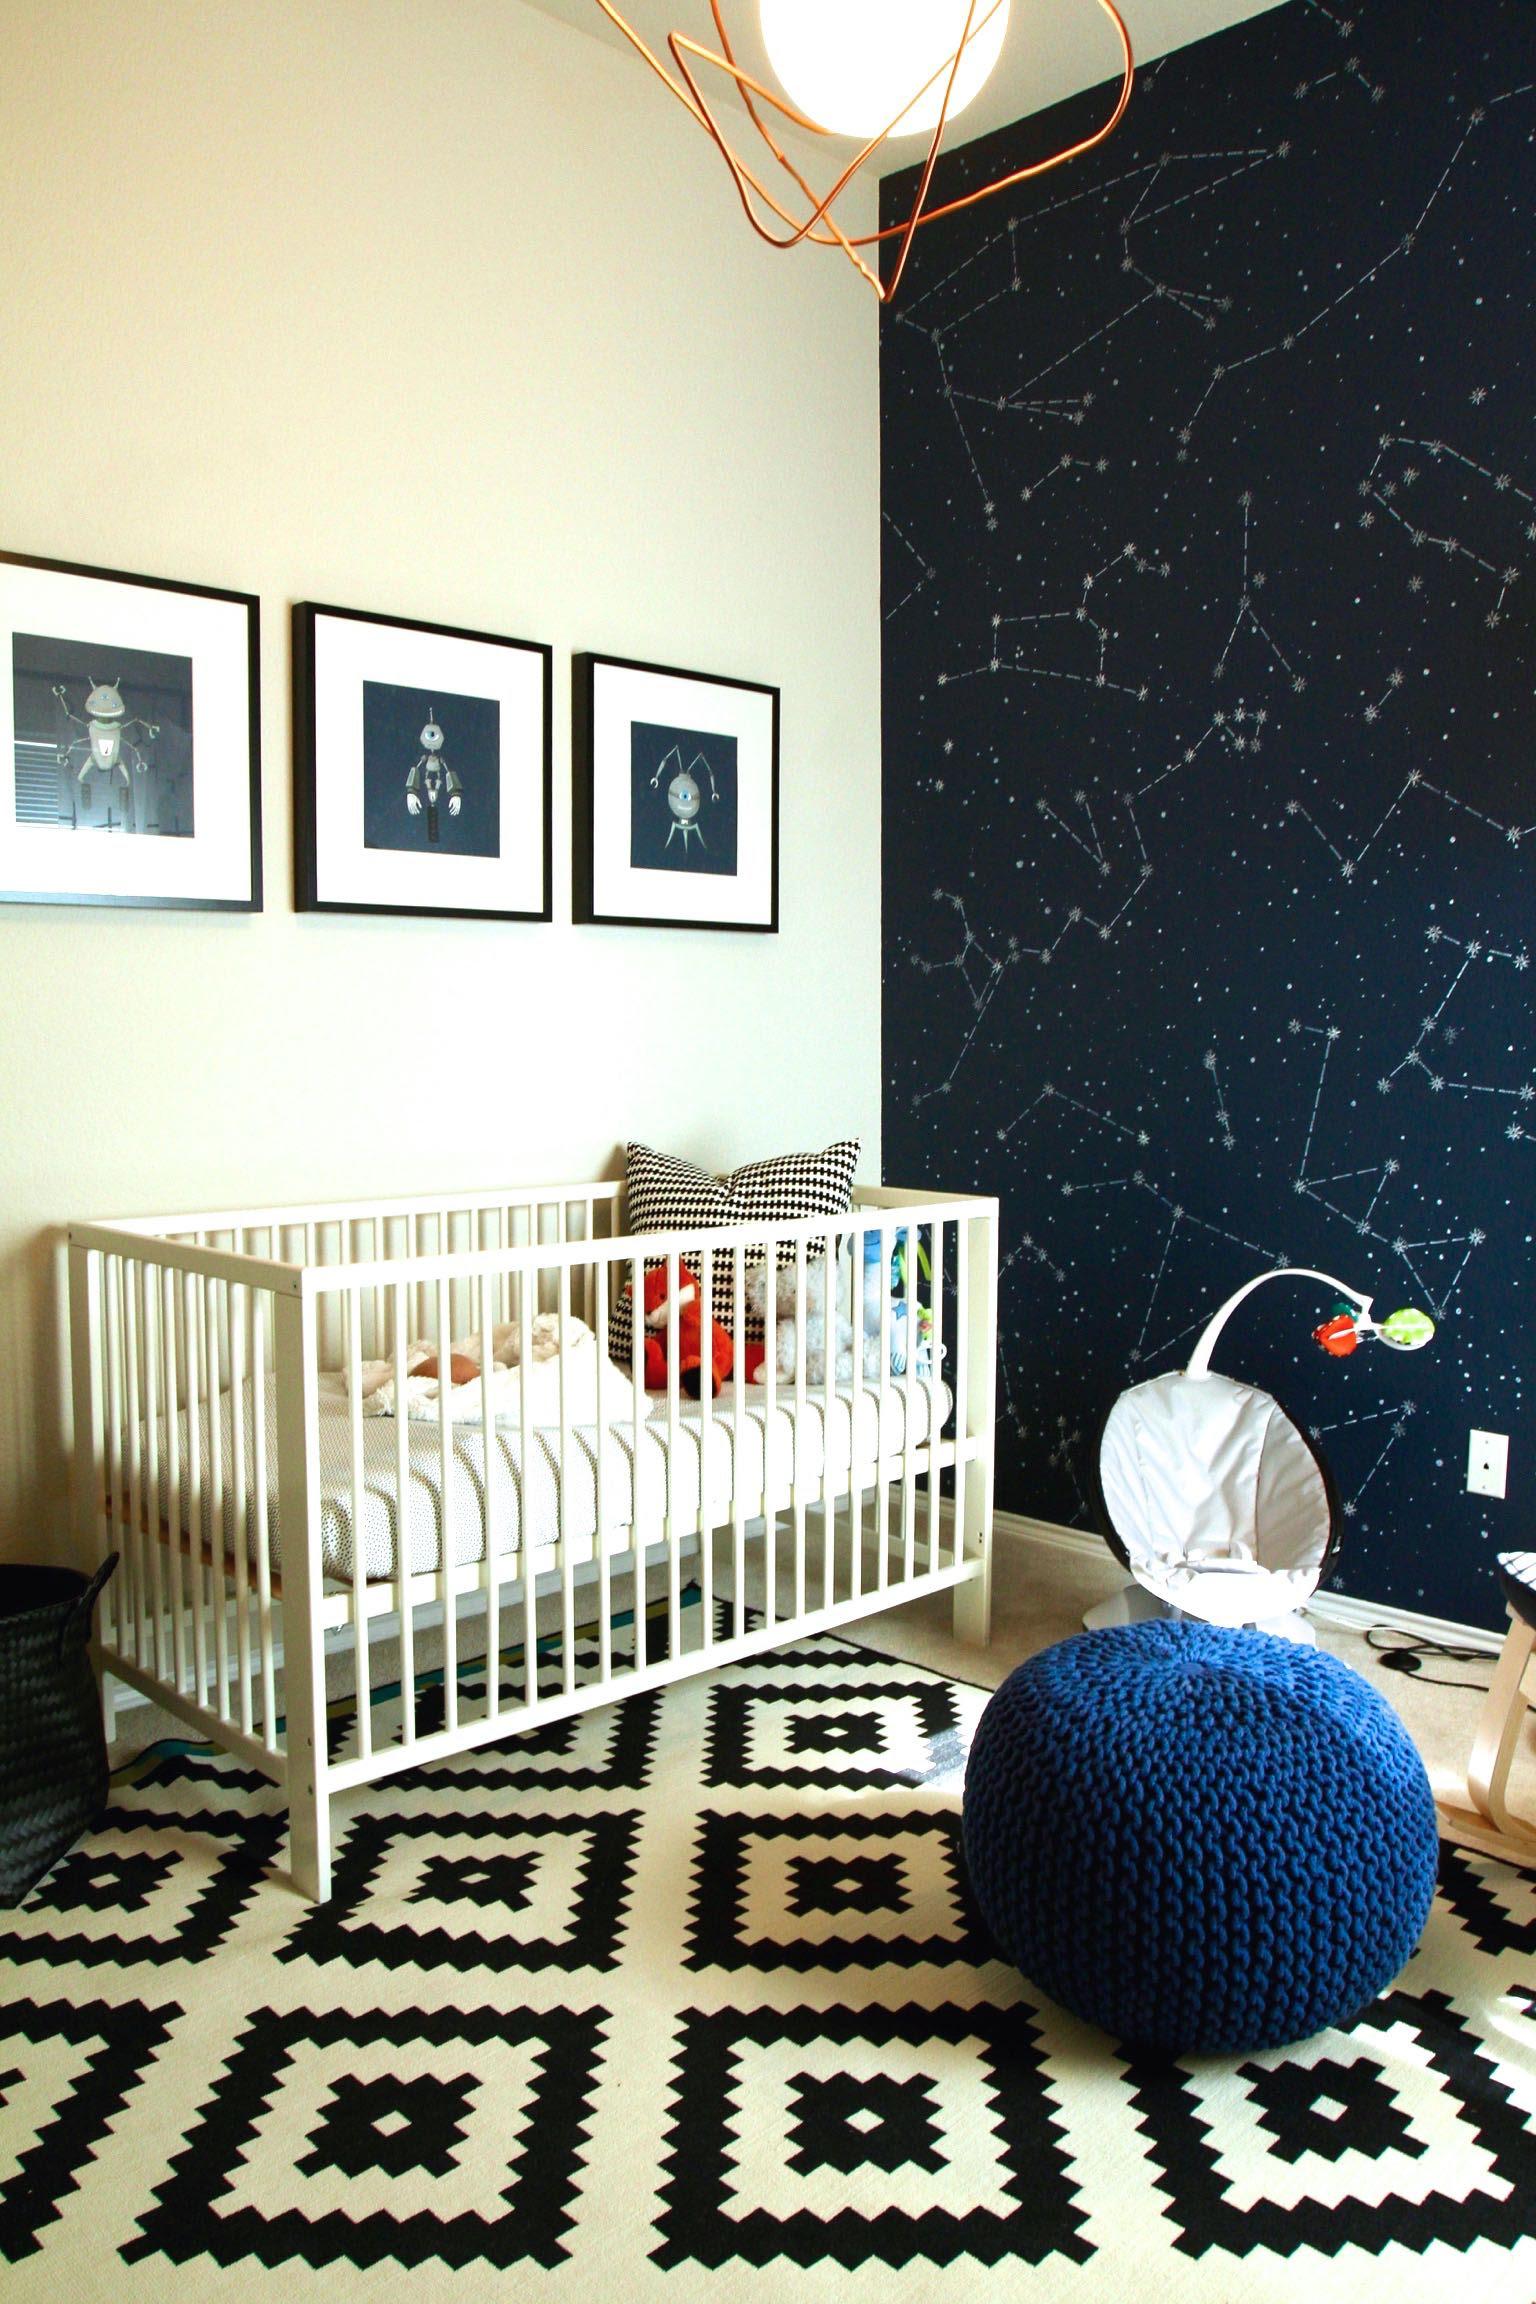 Kaiven's Space Nursery - Project Nursery